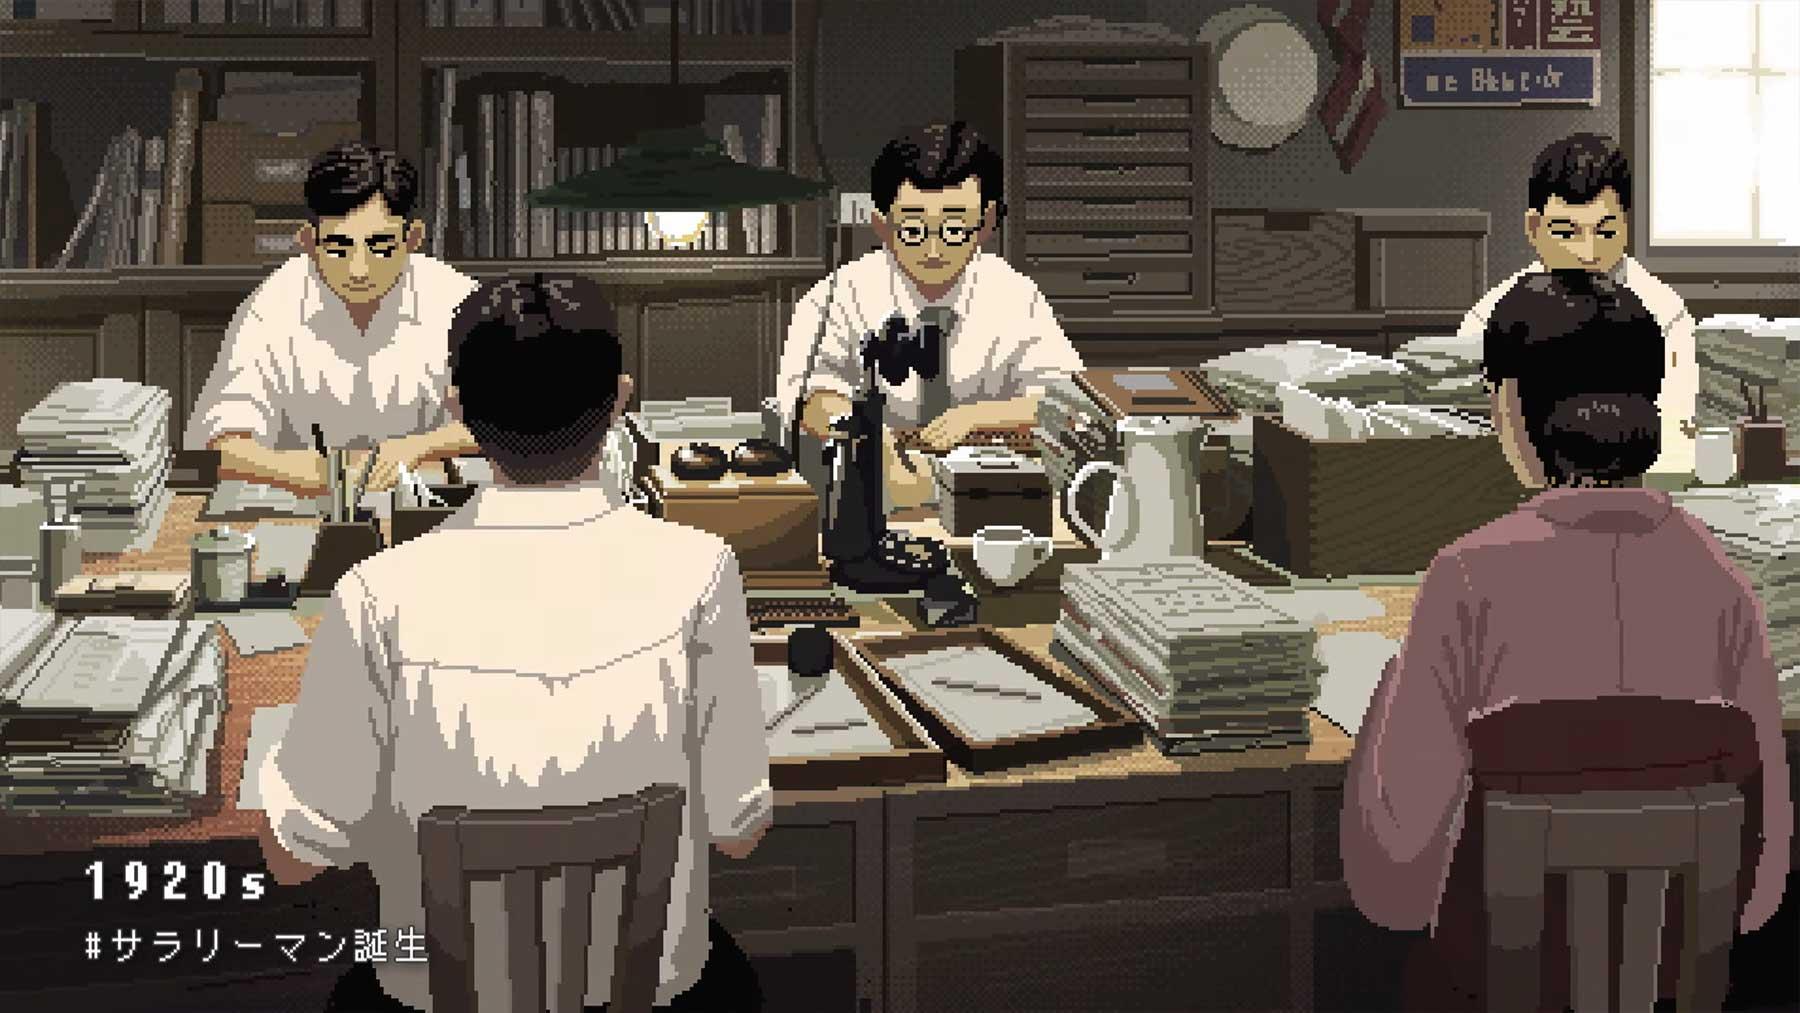 100 Jahre japanische Arbeitskultur im Pixel-Look